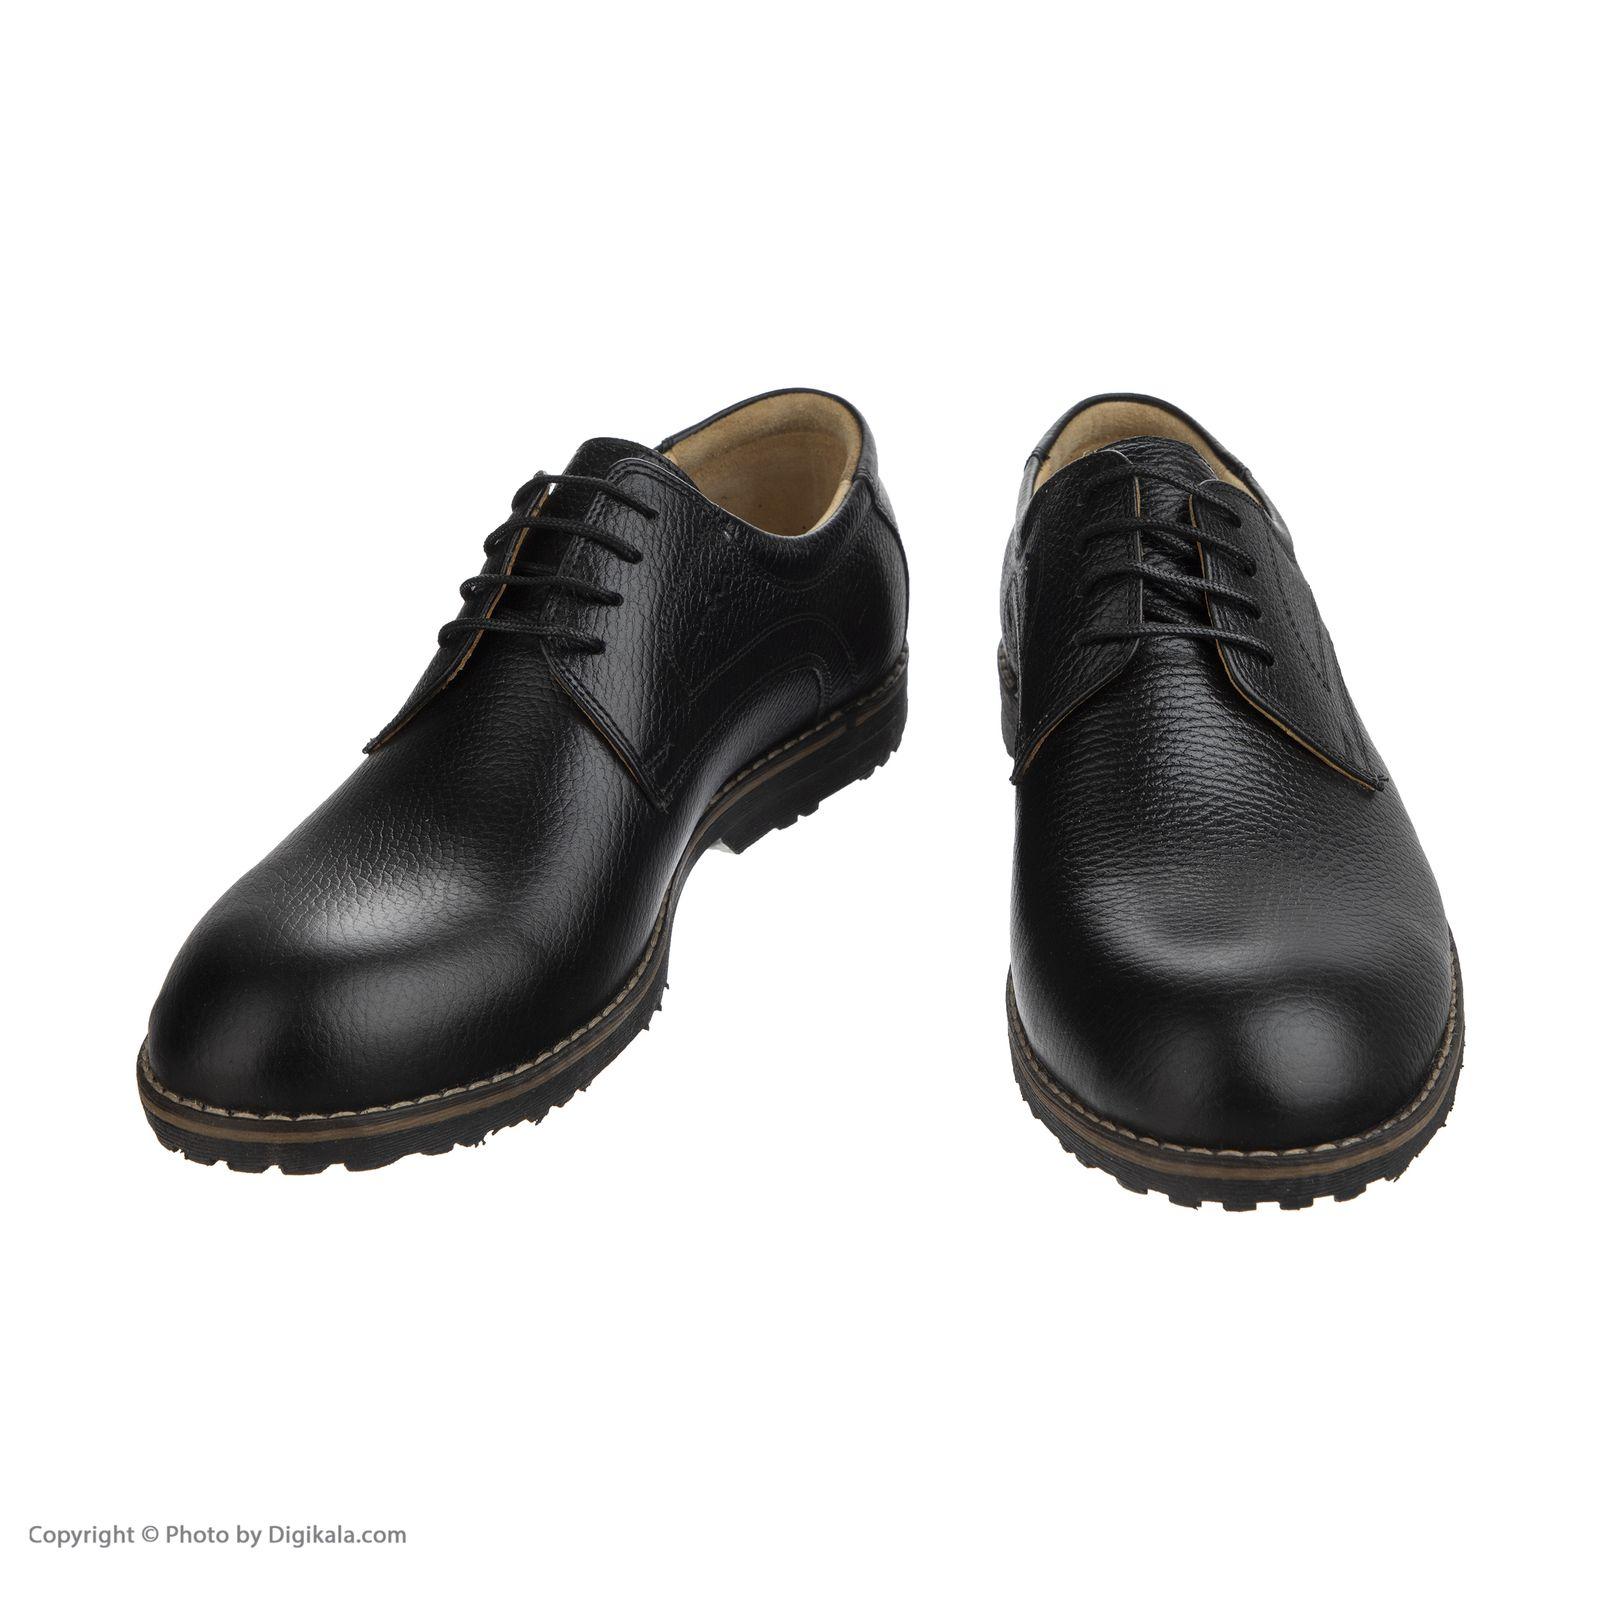 کفش روزمره مردانه شیفر مدل 7046N503101 -  - 4